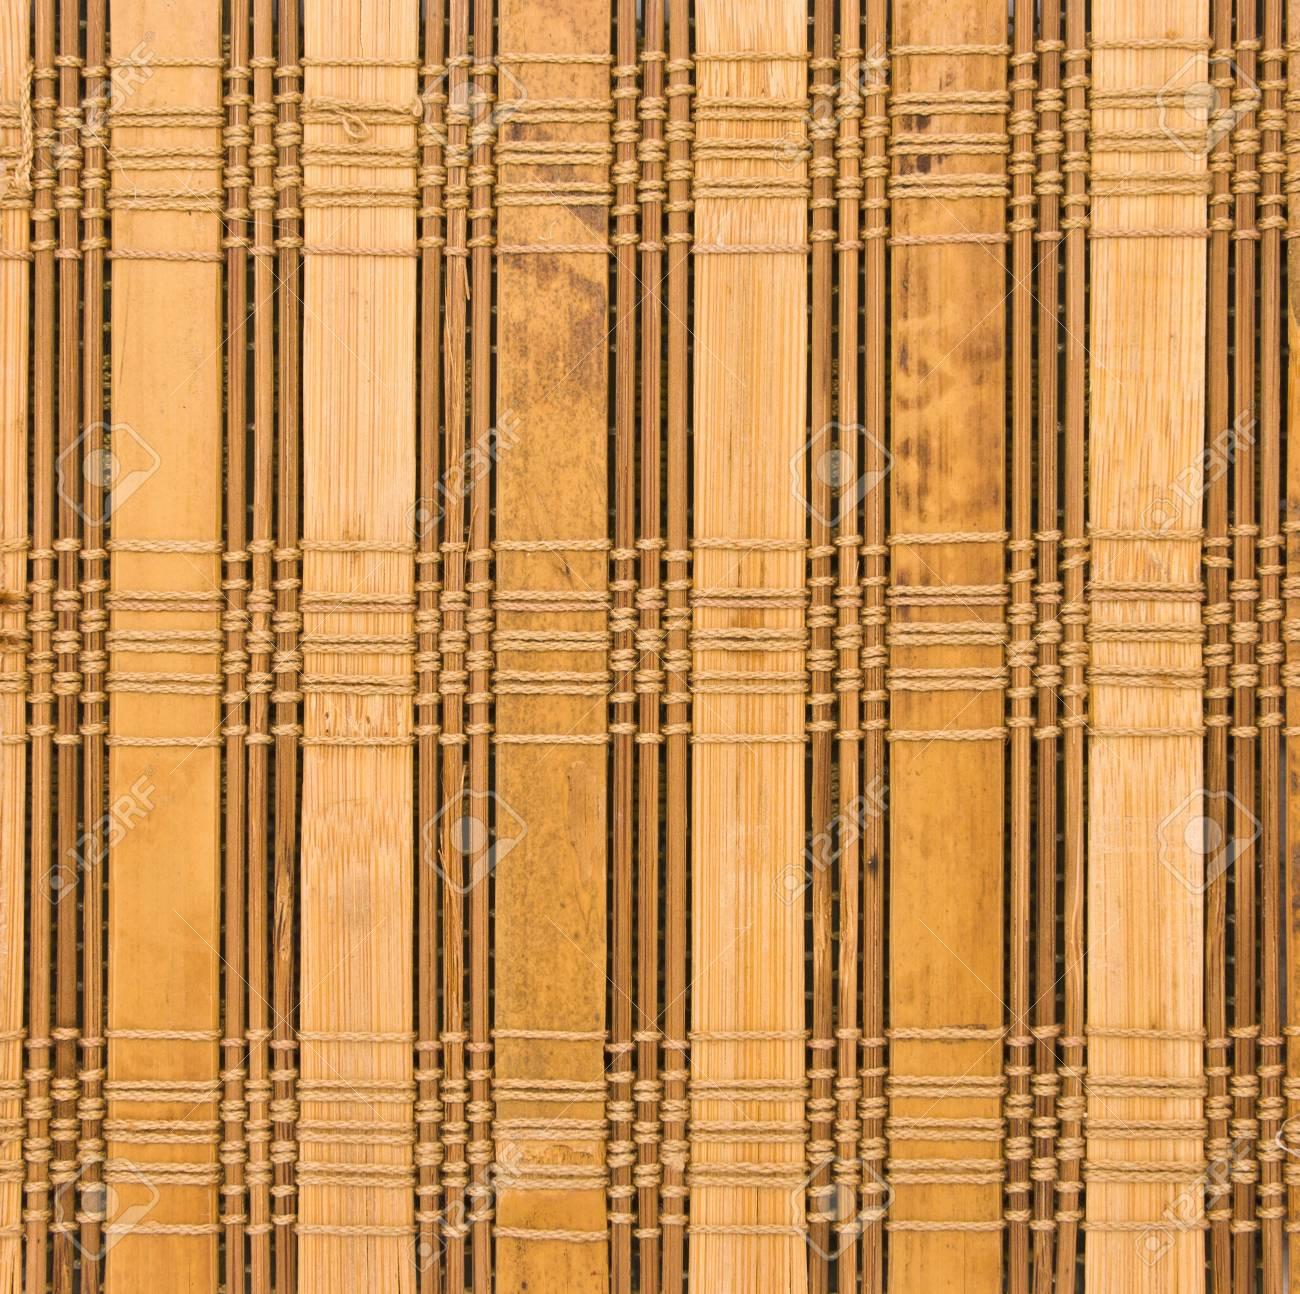 pres de tissu du rideau en bambou motif